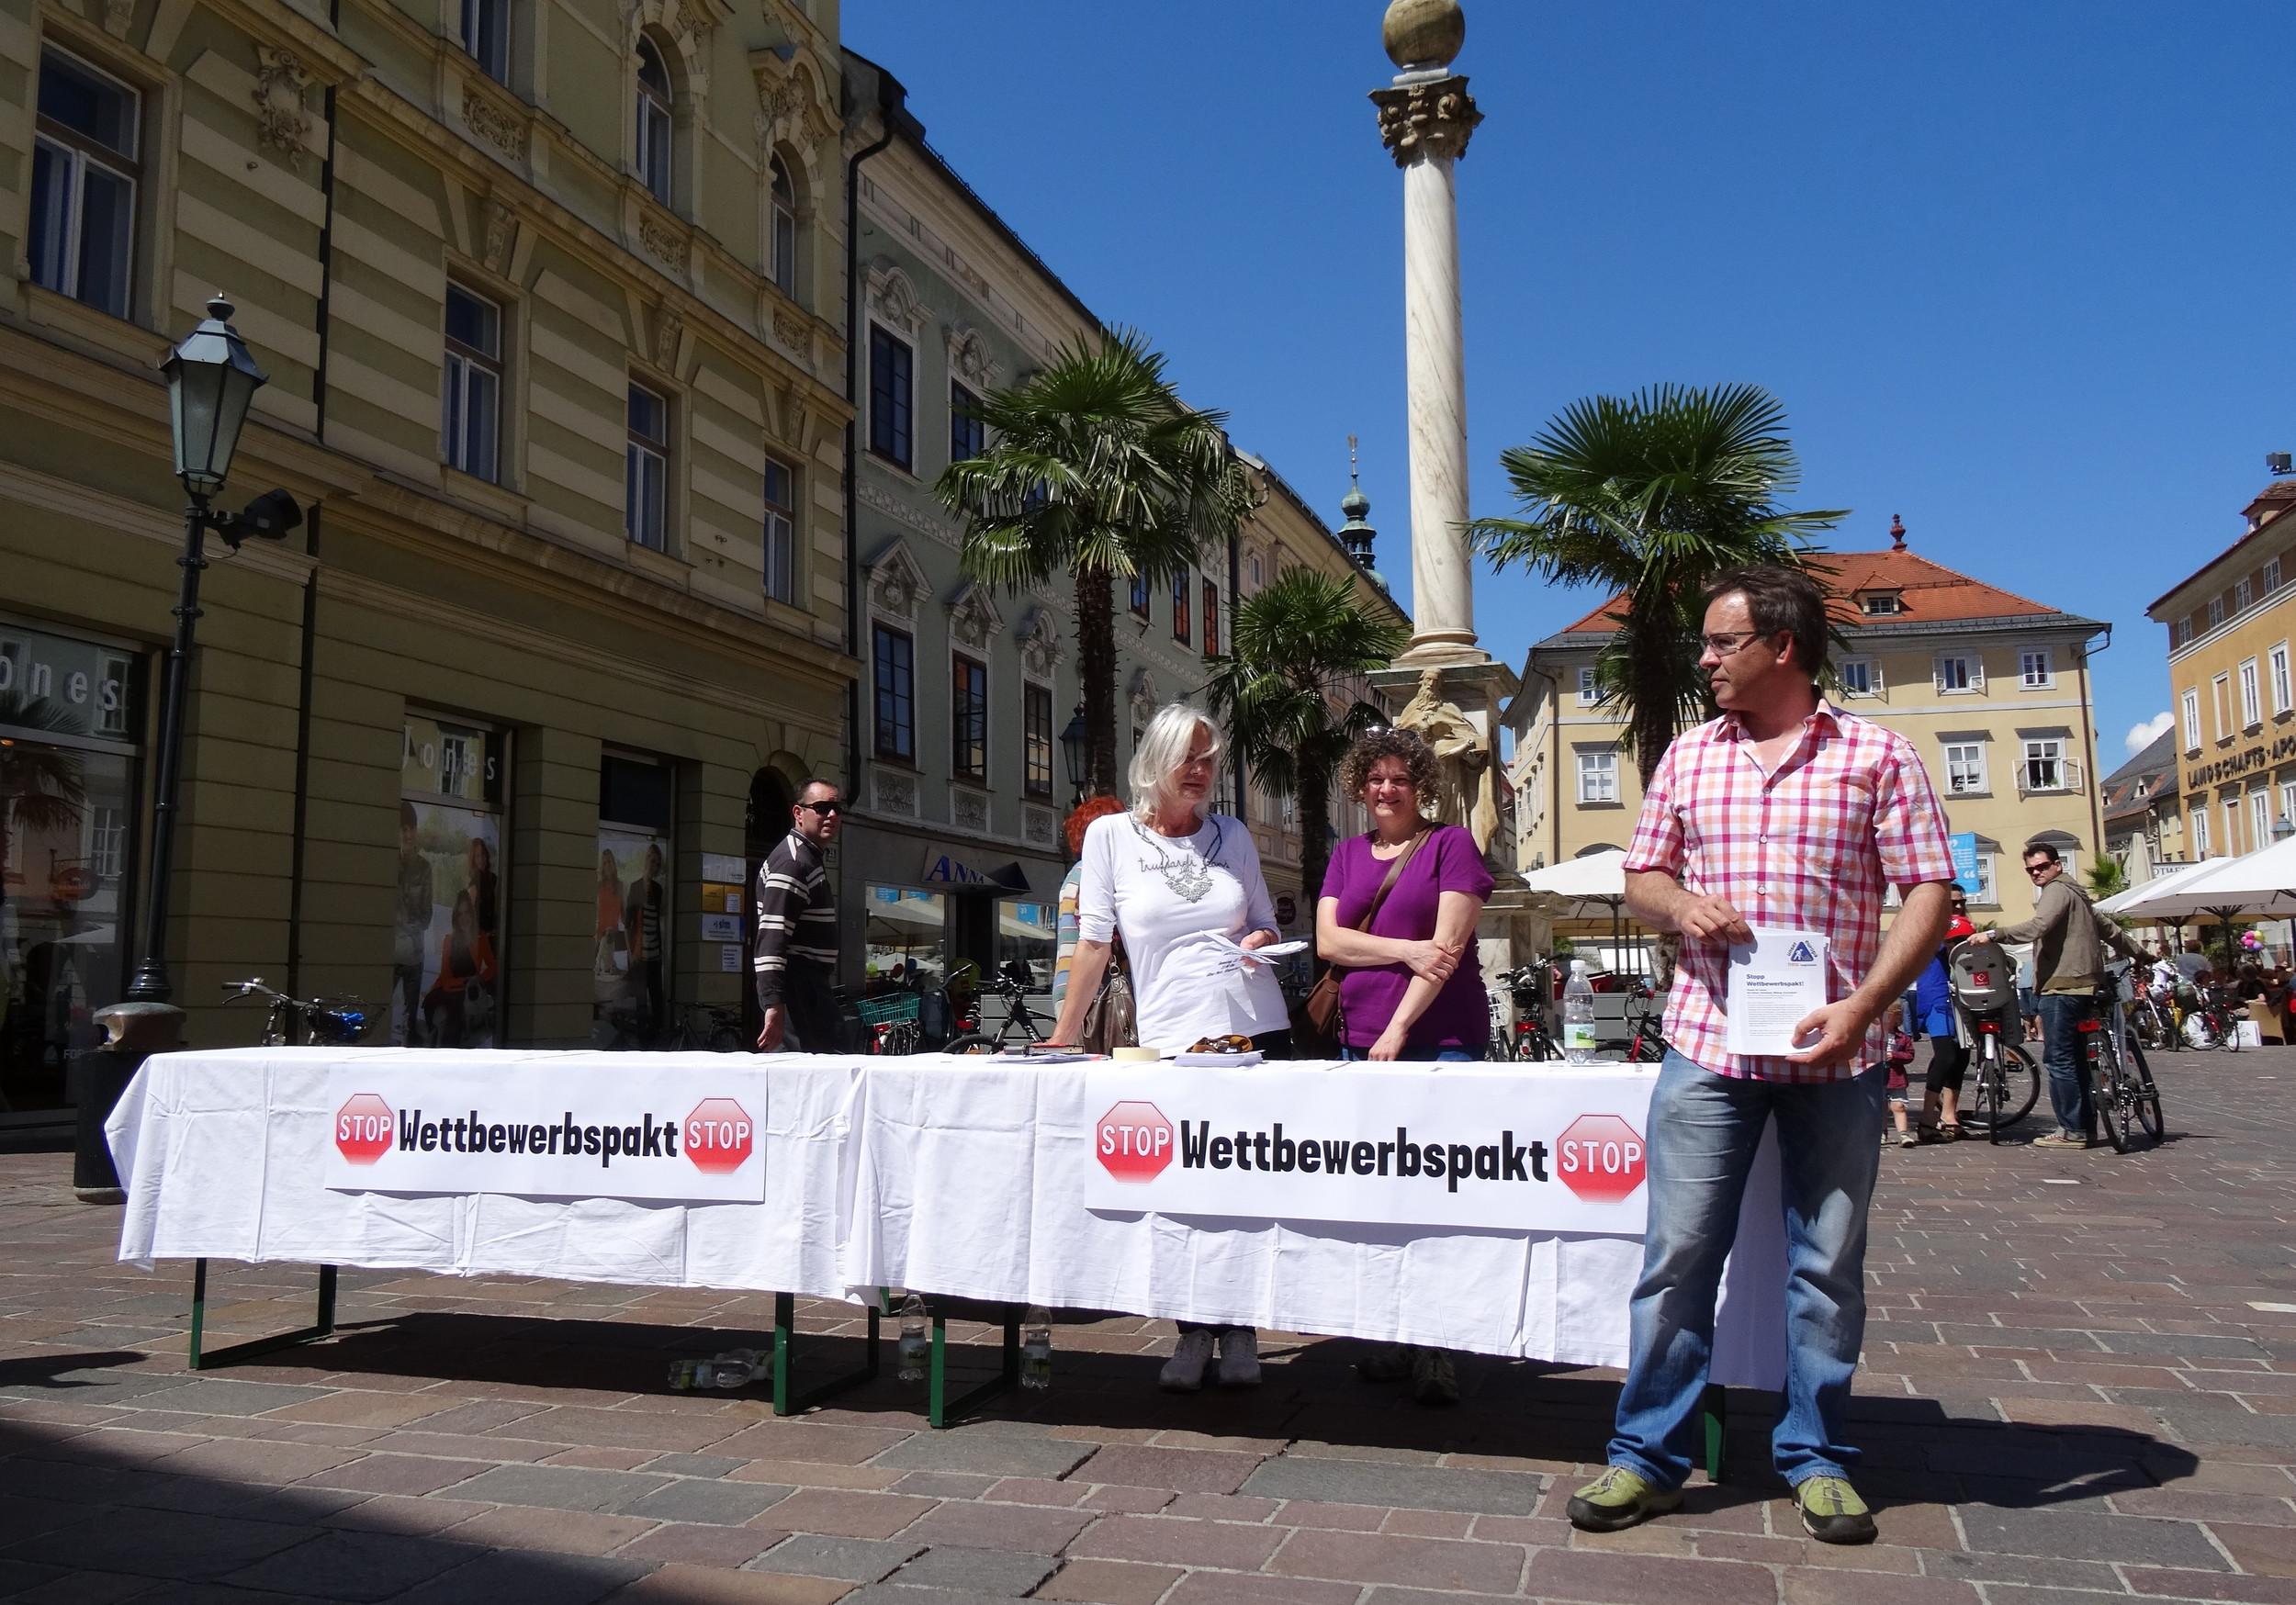 Klagenfurt (Asok, Attac, BGE...)